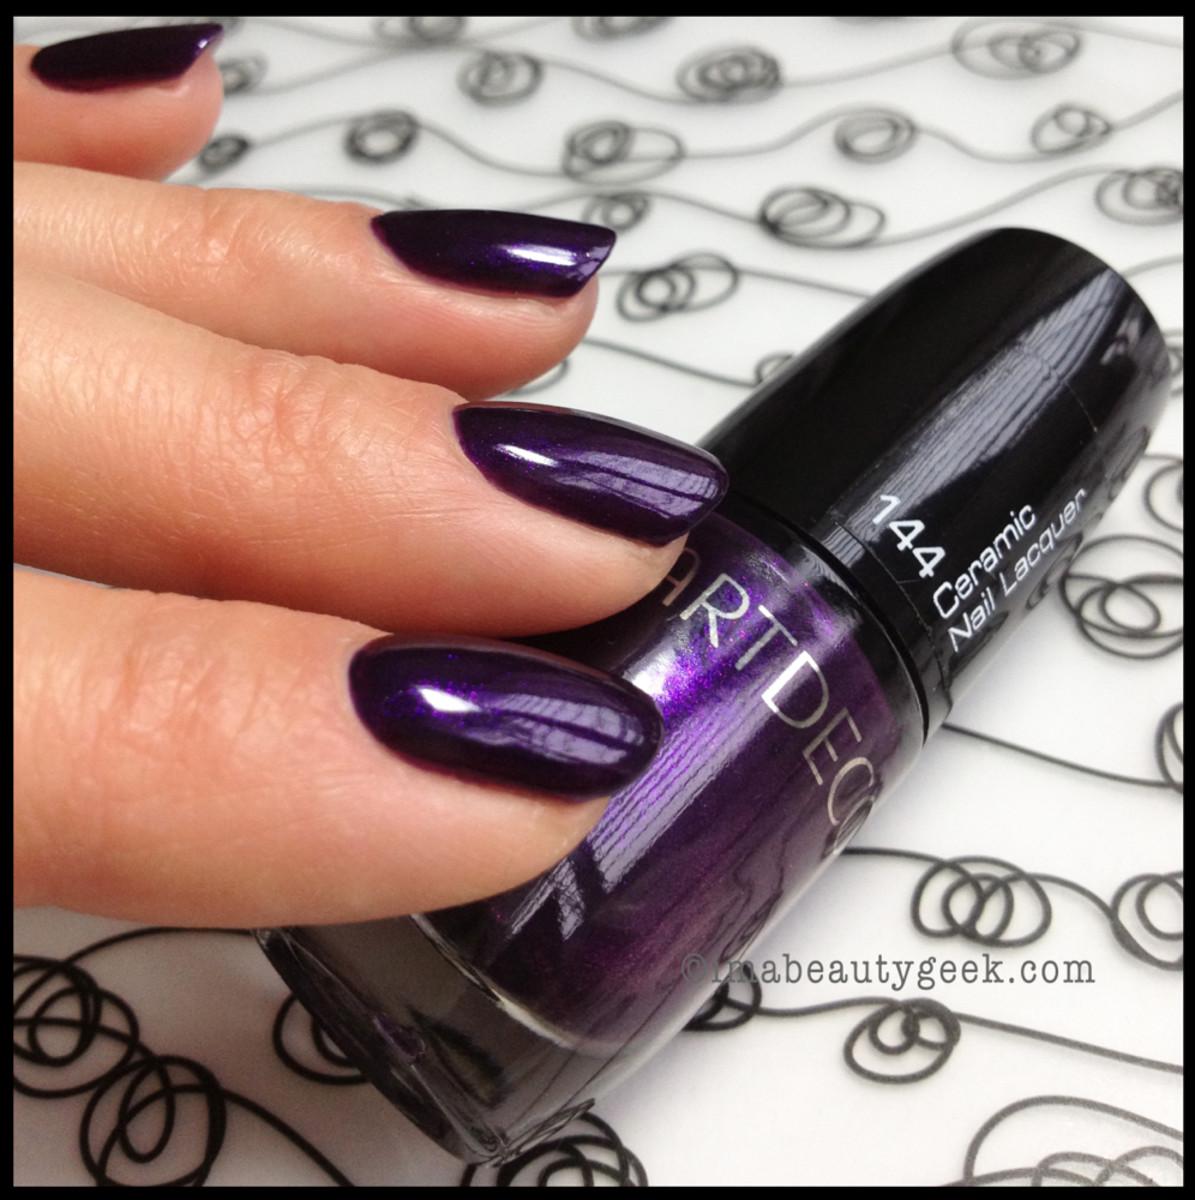 ARTDECO 144 Pearly Crystal Lilac